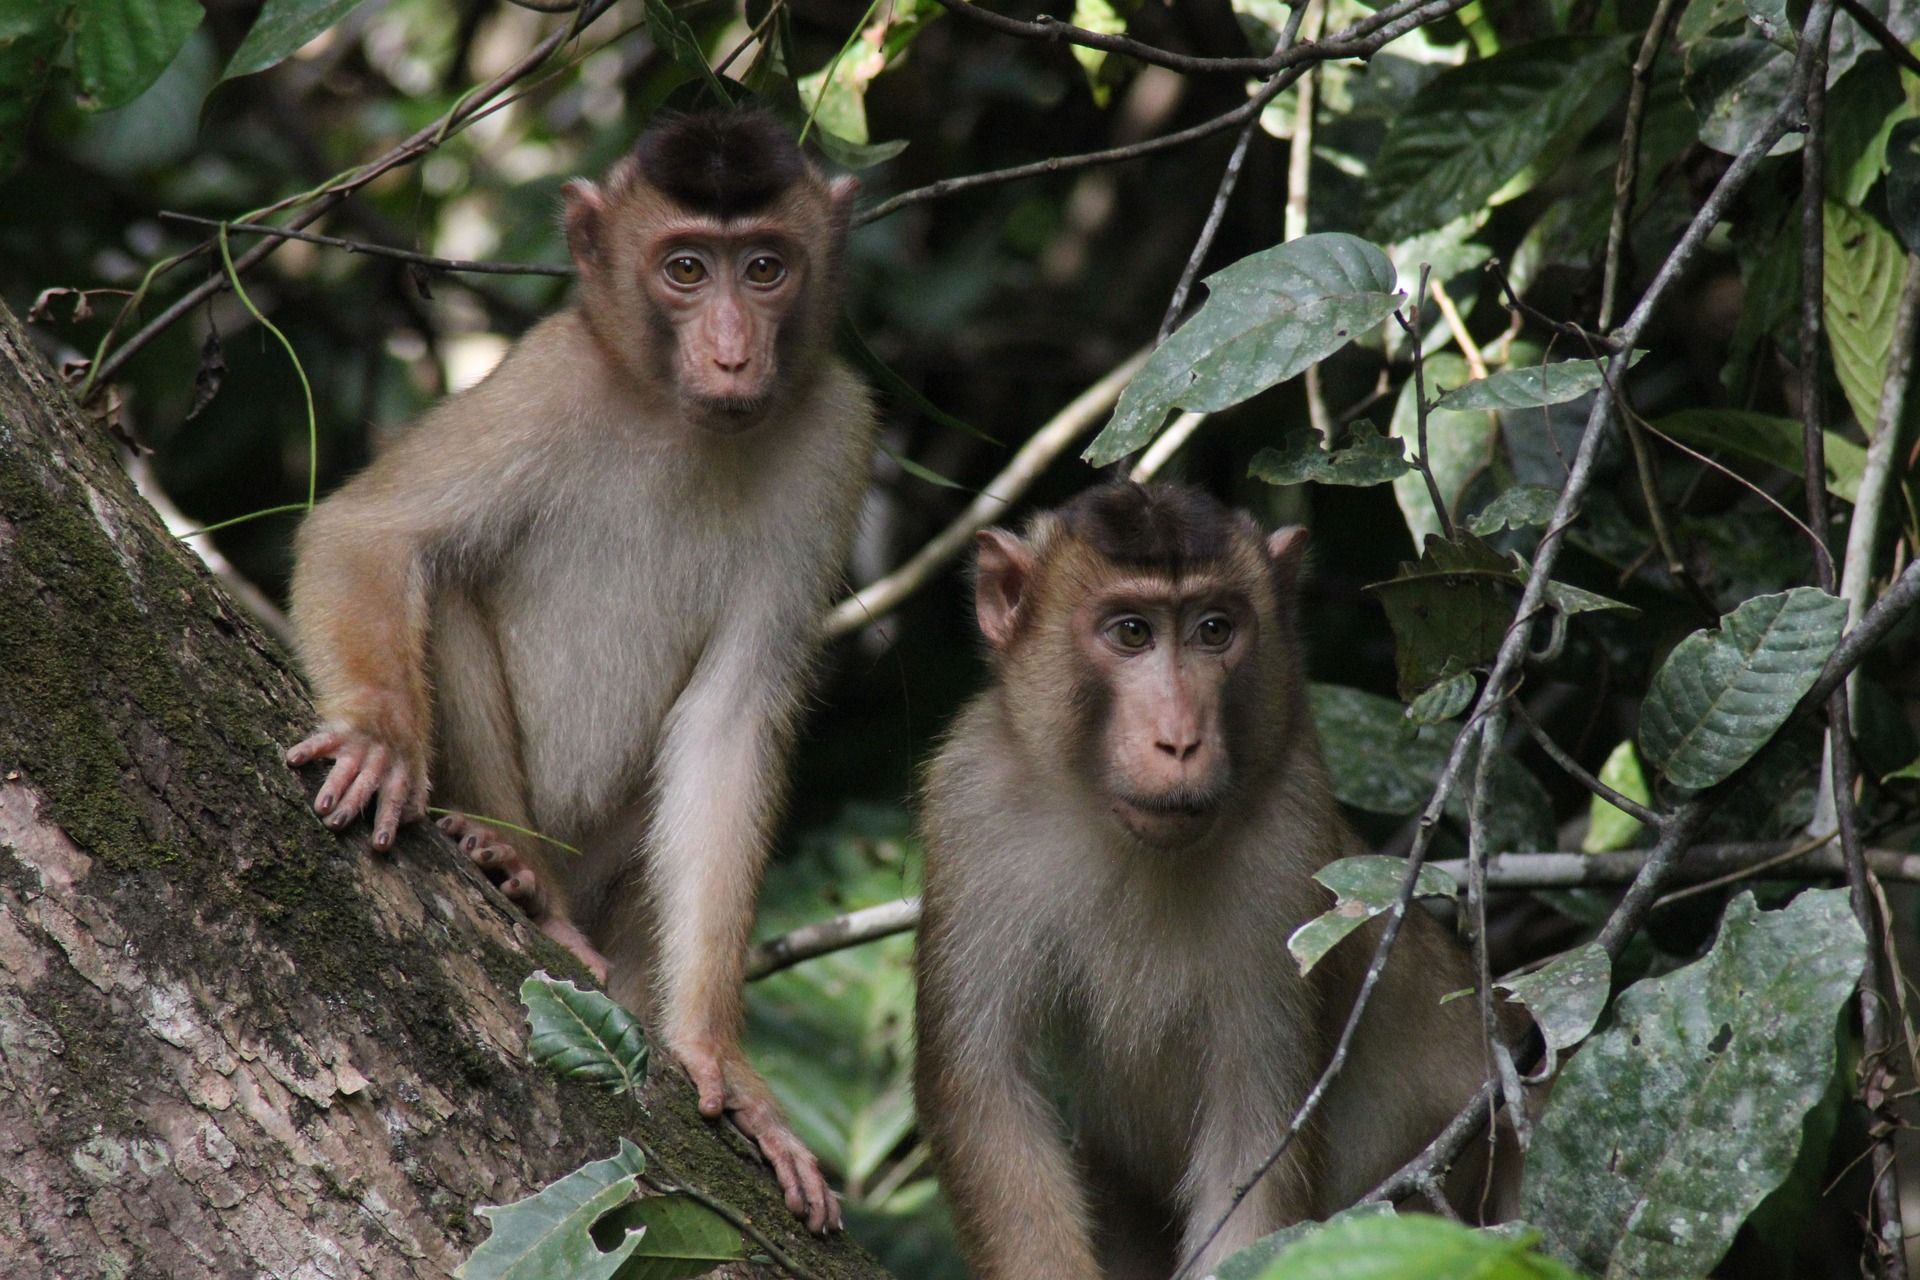 monkeys-1351743_1920.jpg